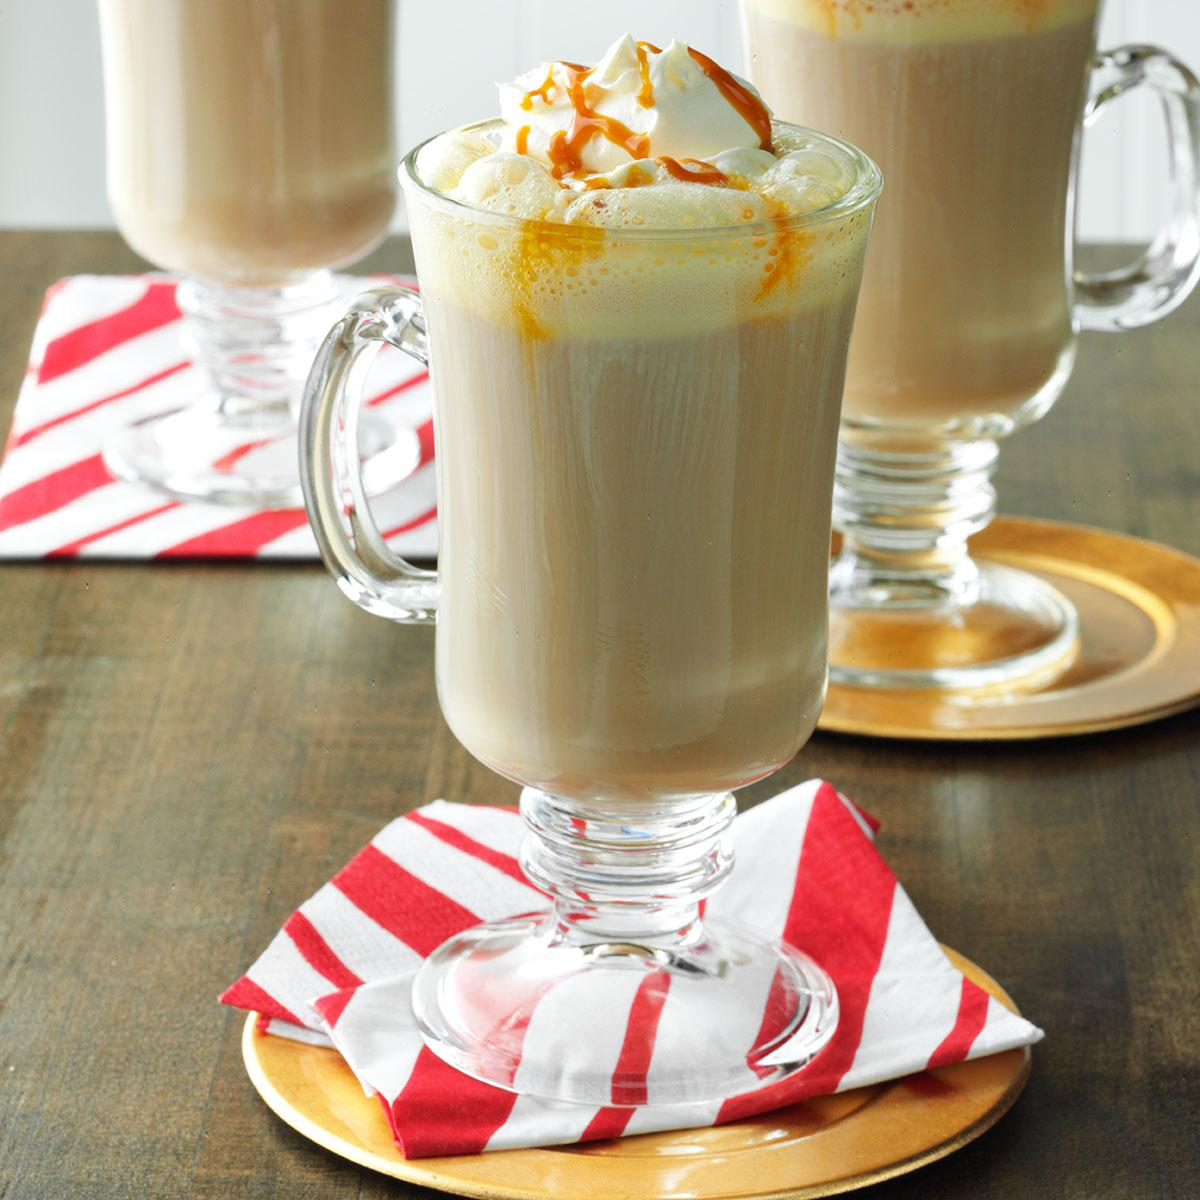 caramel chai tea latte recipe taste of home. Black Bedroom Furniture Sets. Home Design Ideas